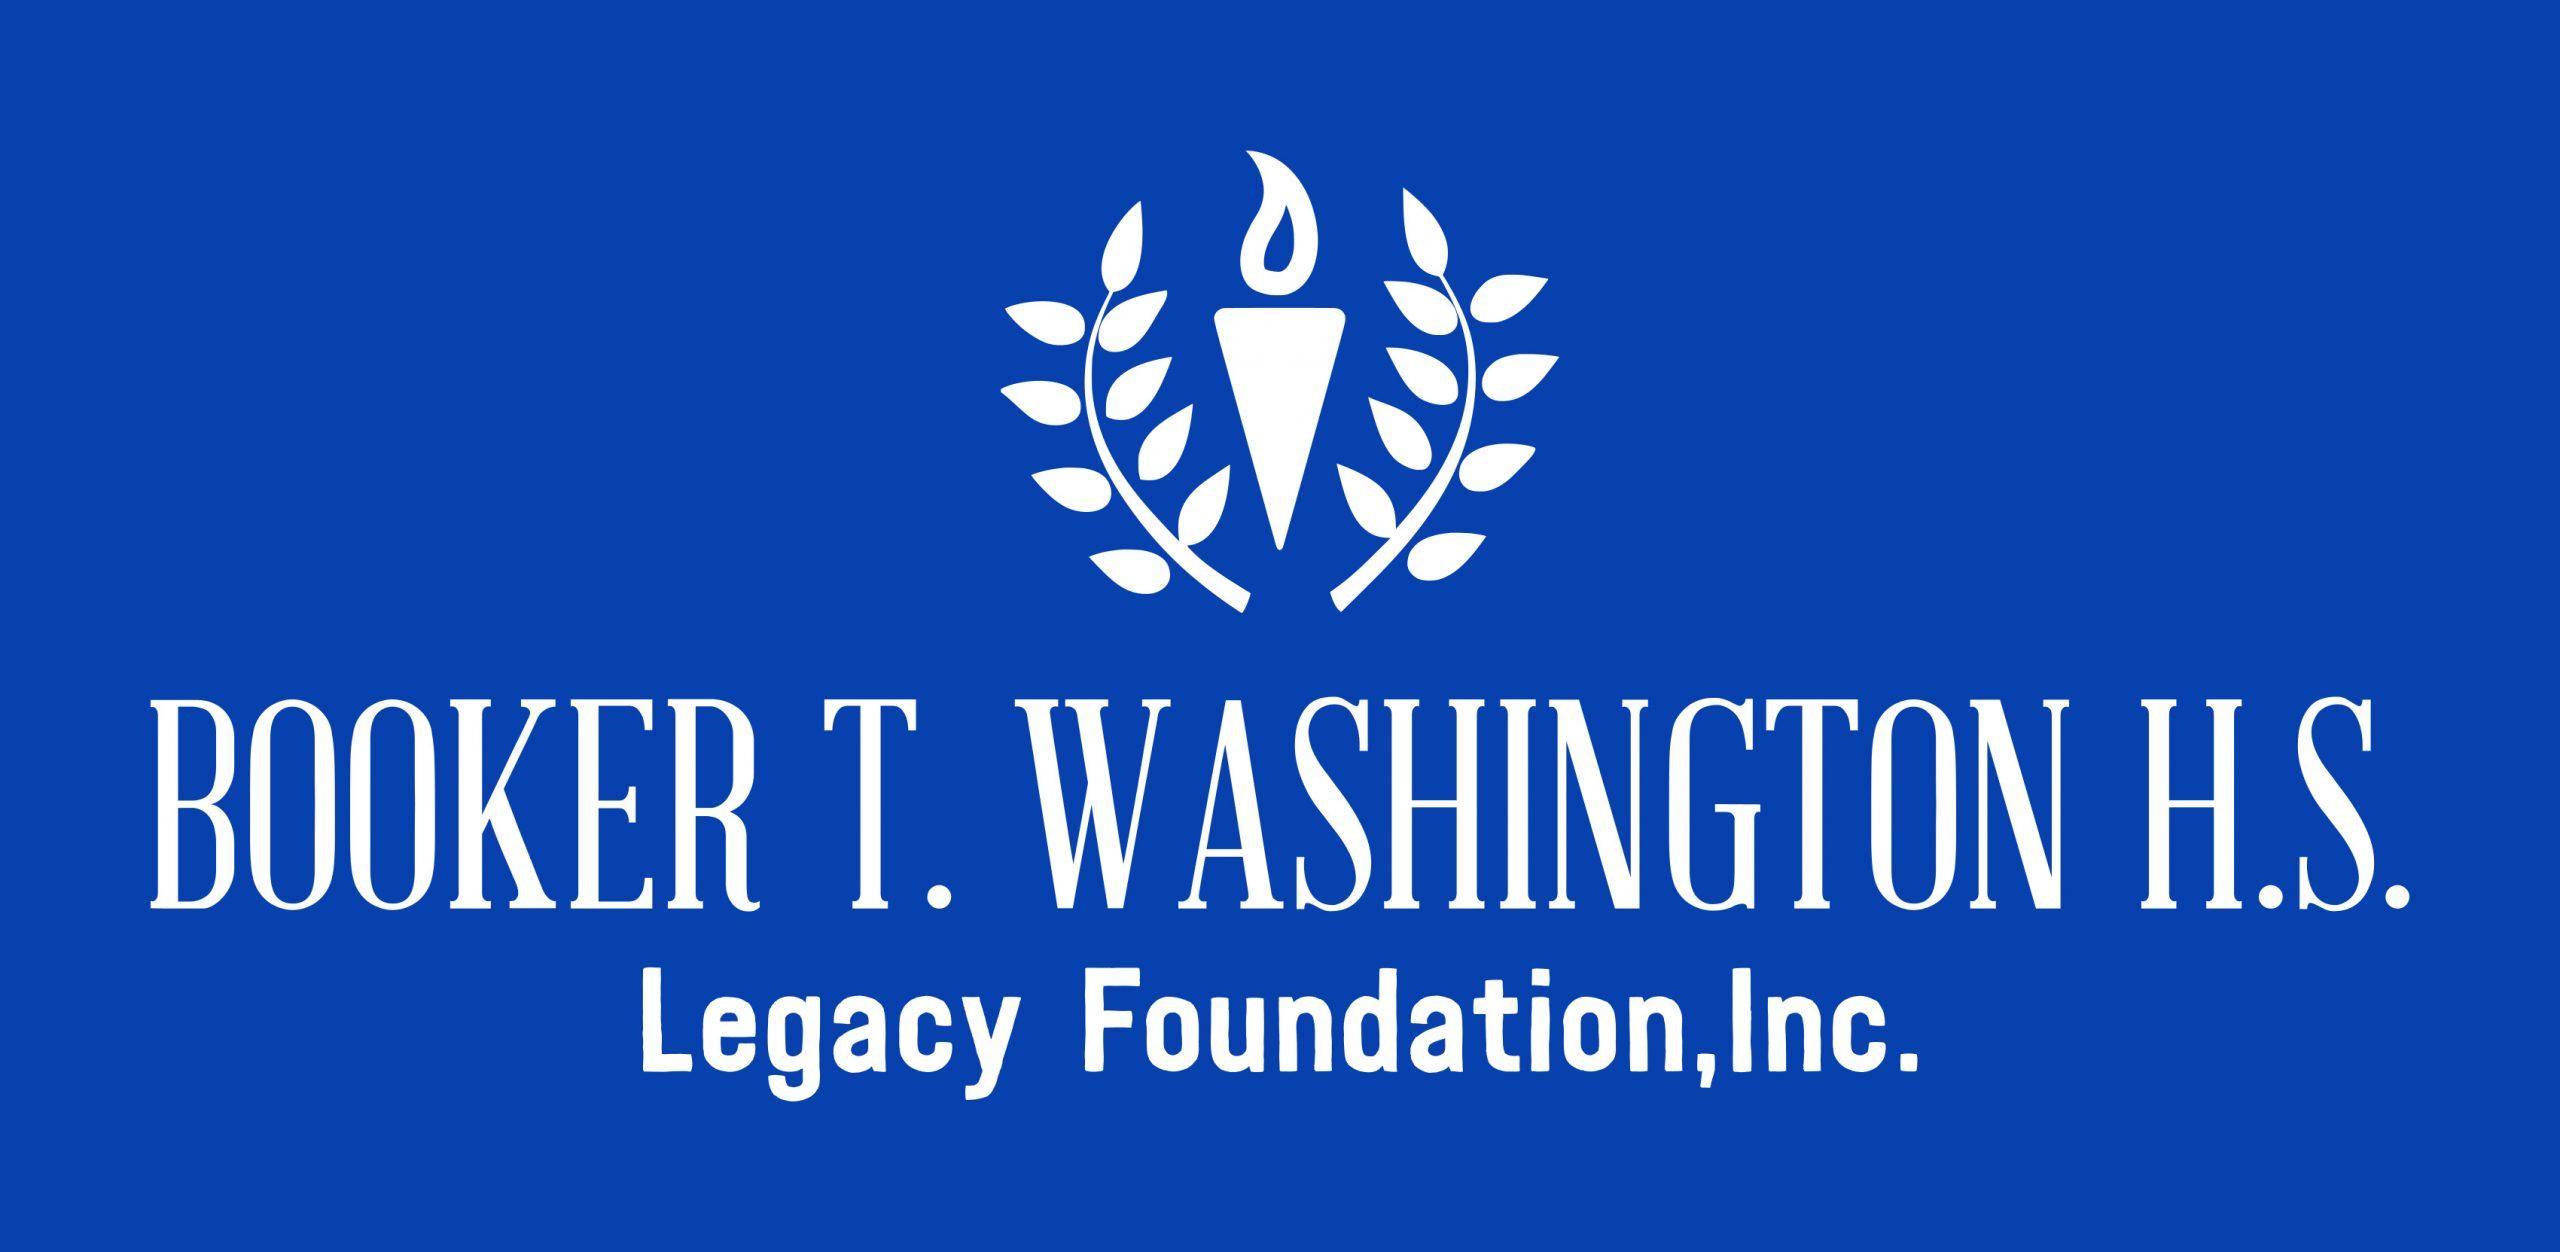 Booker T. Washington High School Legacy Foundation